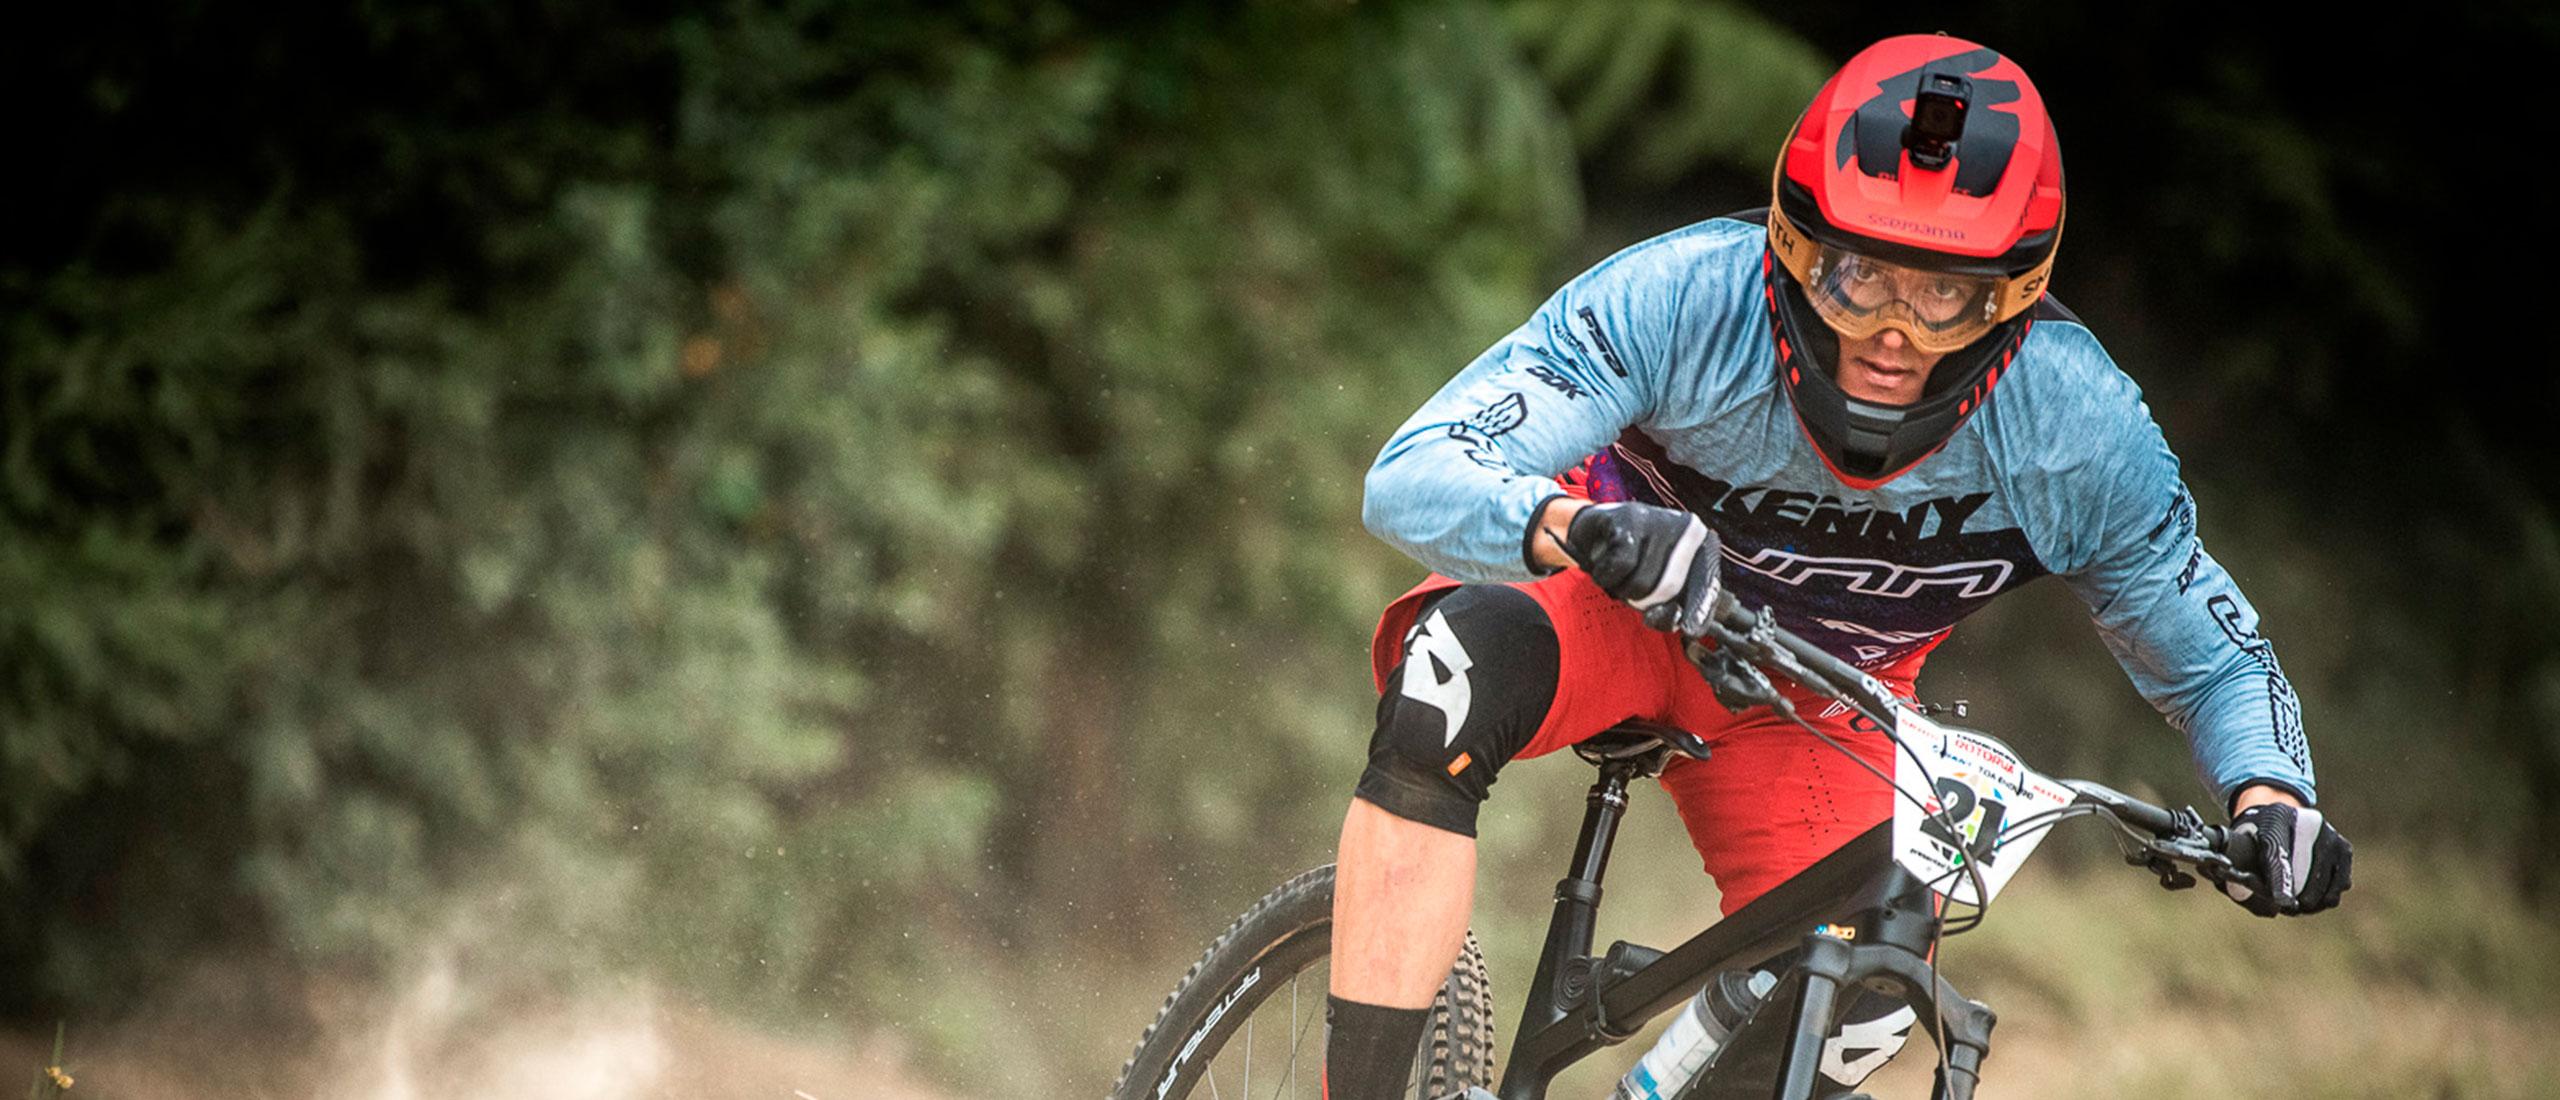 Bluegrass Skinny D3O Knee Protection made for Mountain Bike, Enduro and E-Bike